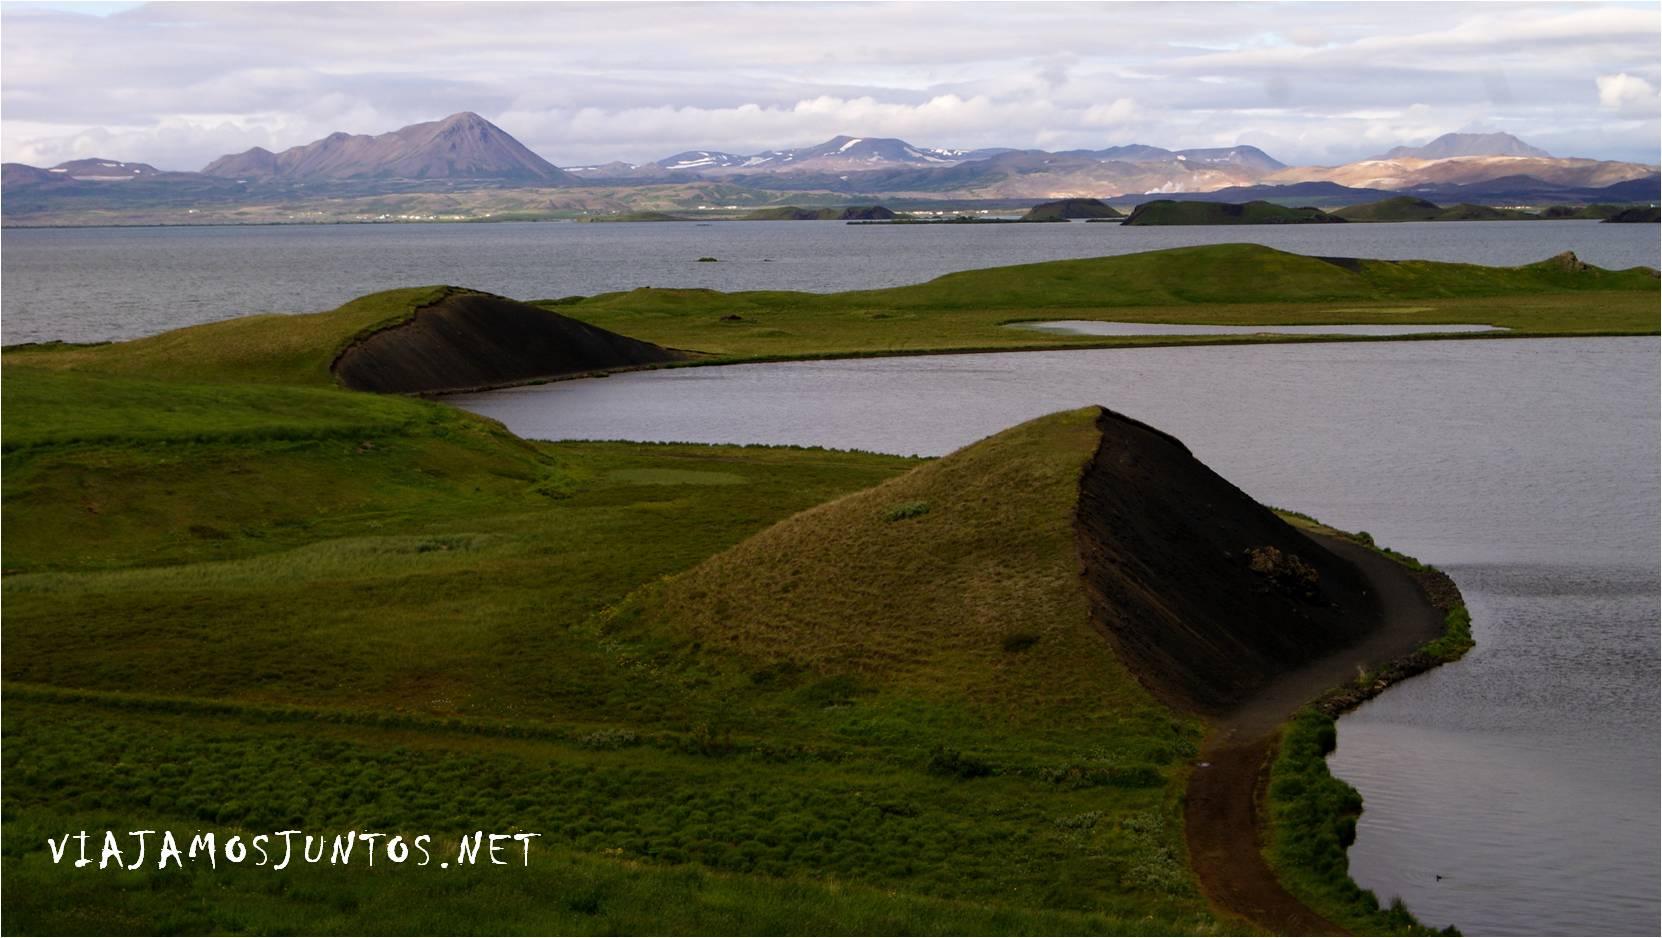 Cráteres falsos, Stakholstjorn, Skutustadir, pseudo cráteres, crateres, volcanes, Islandia, Iceland, rutas, curiosidades